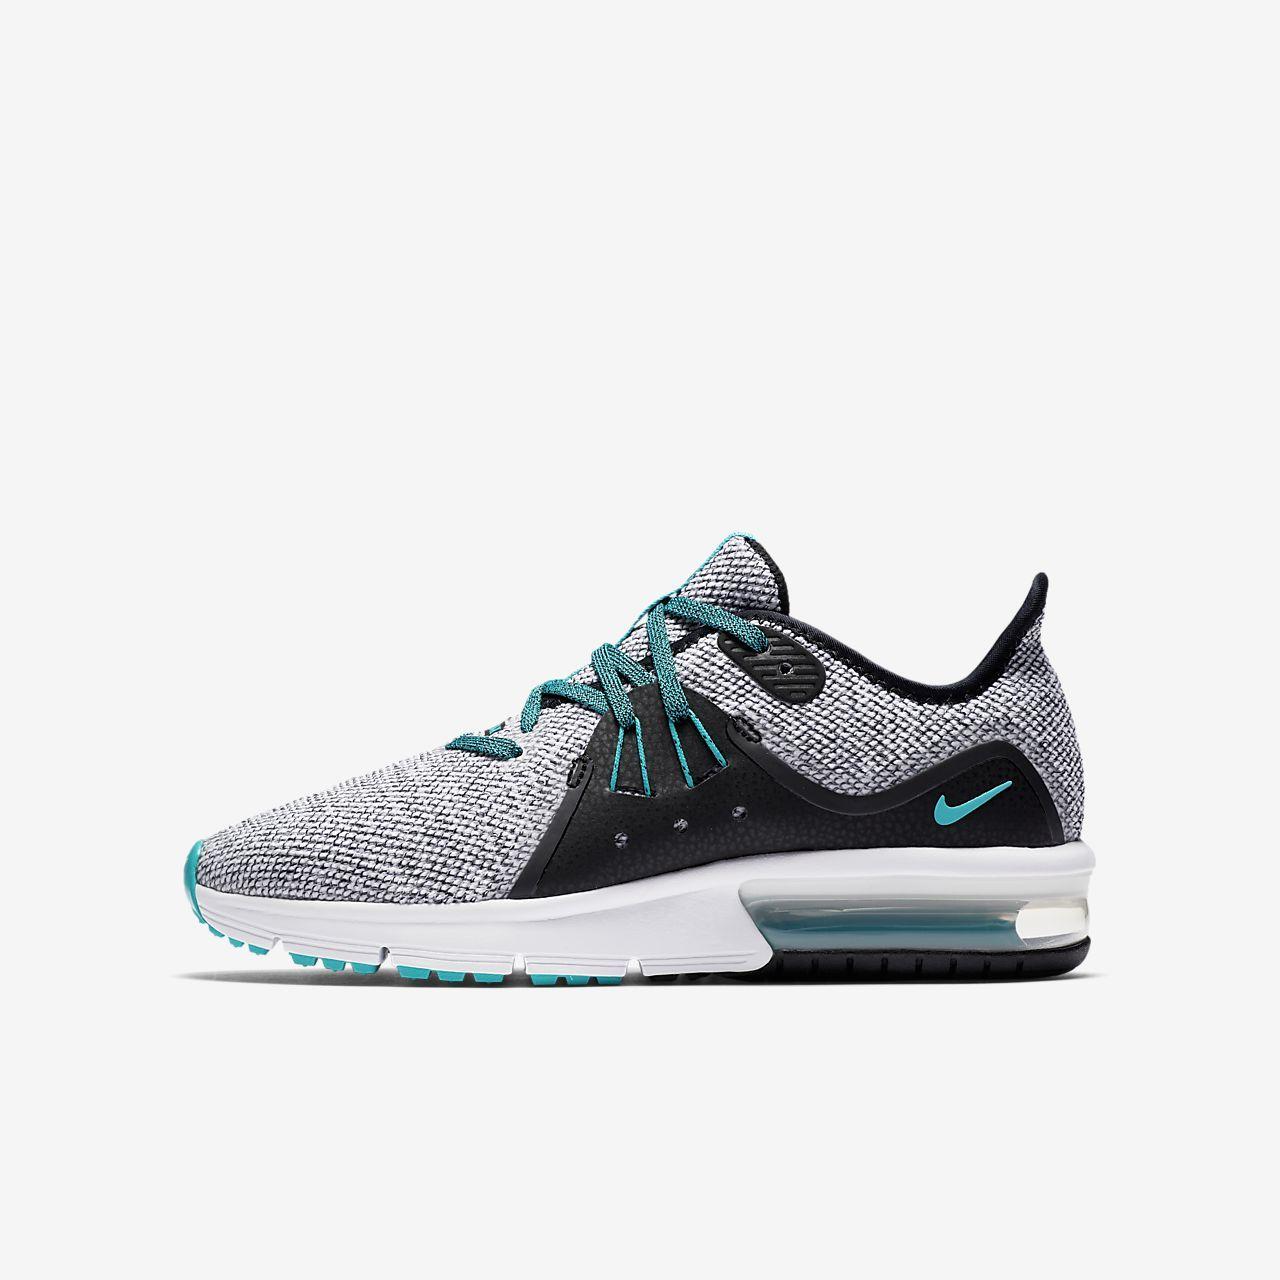 Nike Air Max Sequent 3 Big Kids' Running Shoe | Long